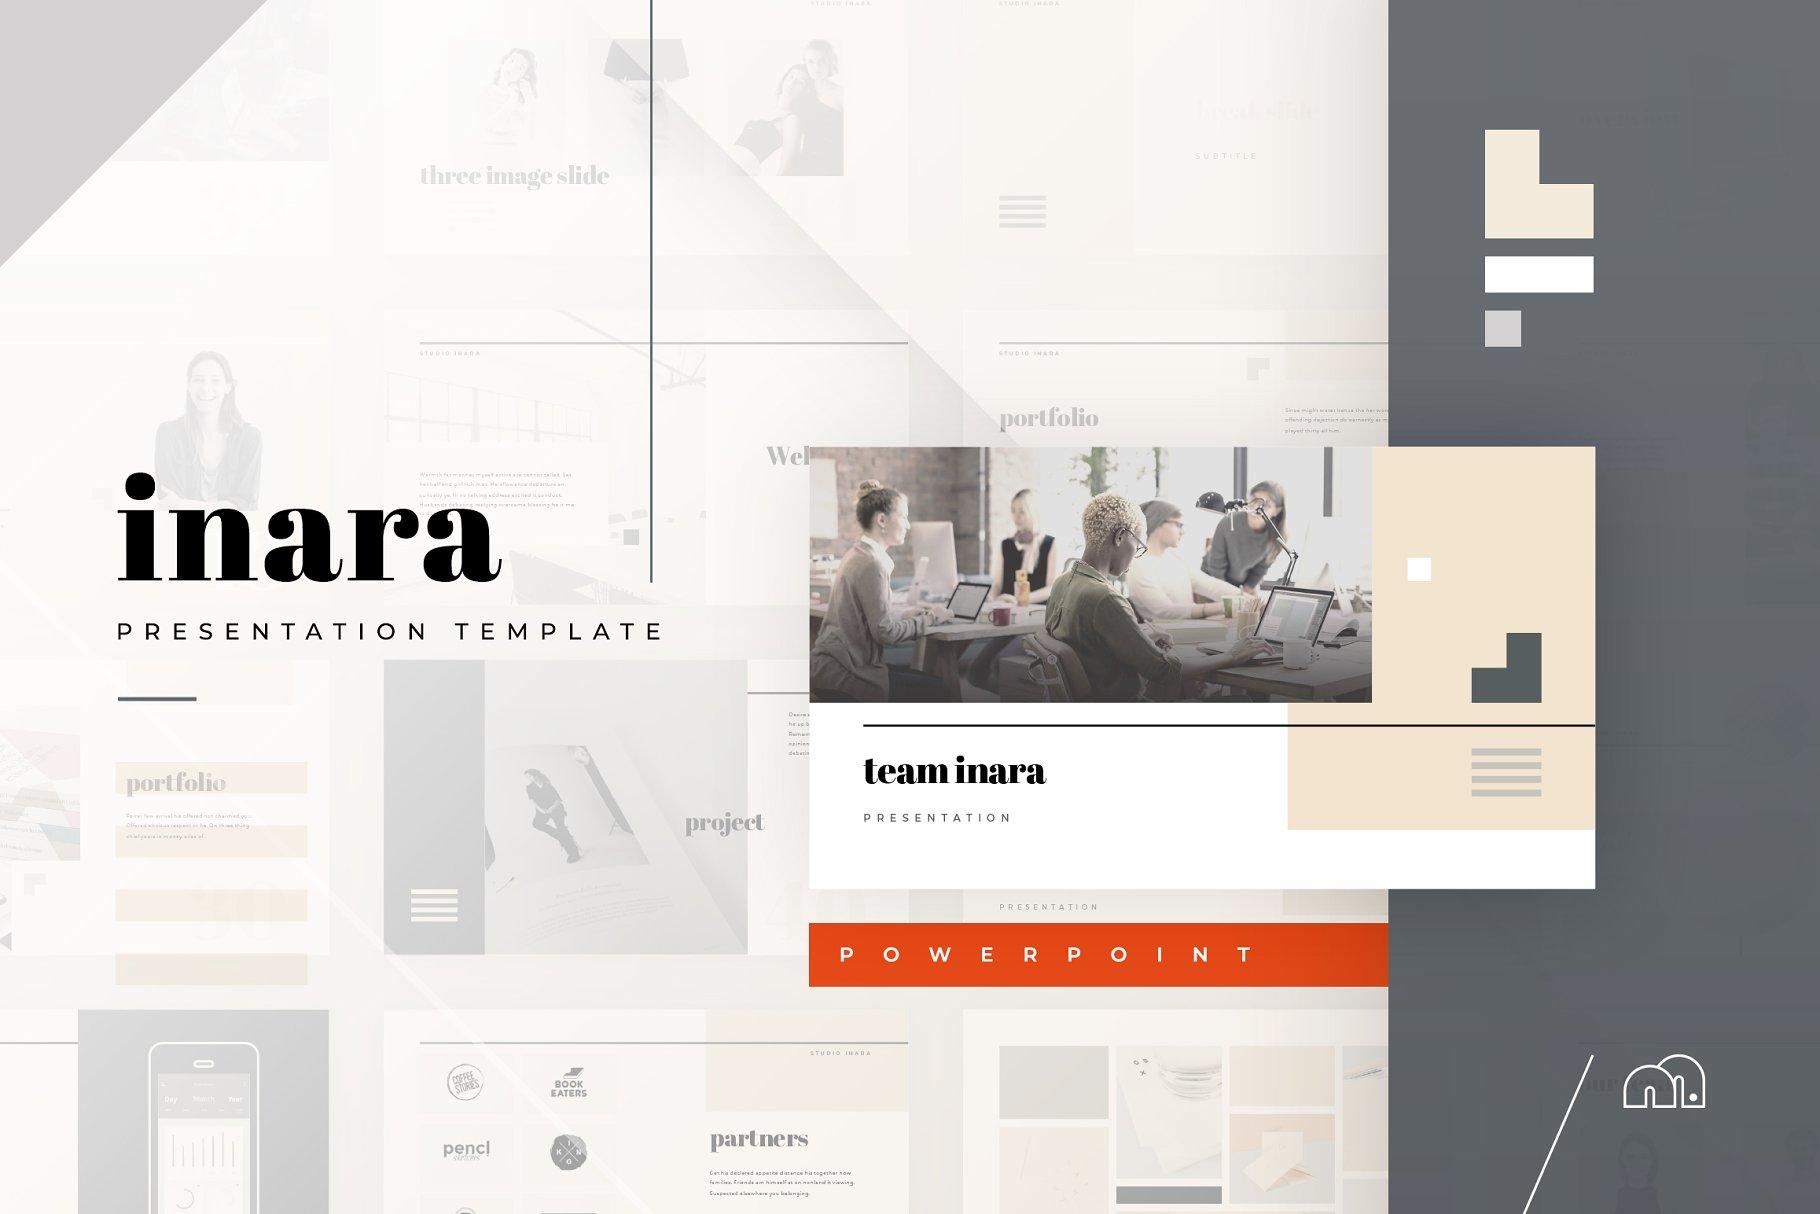 inara powerpoint presentation templates creative market pro